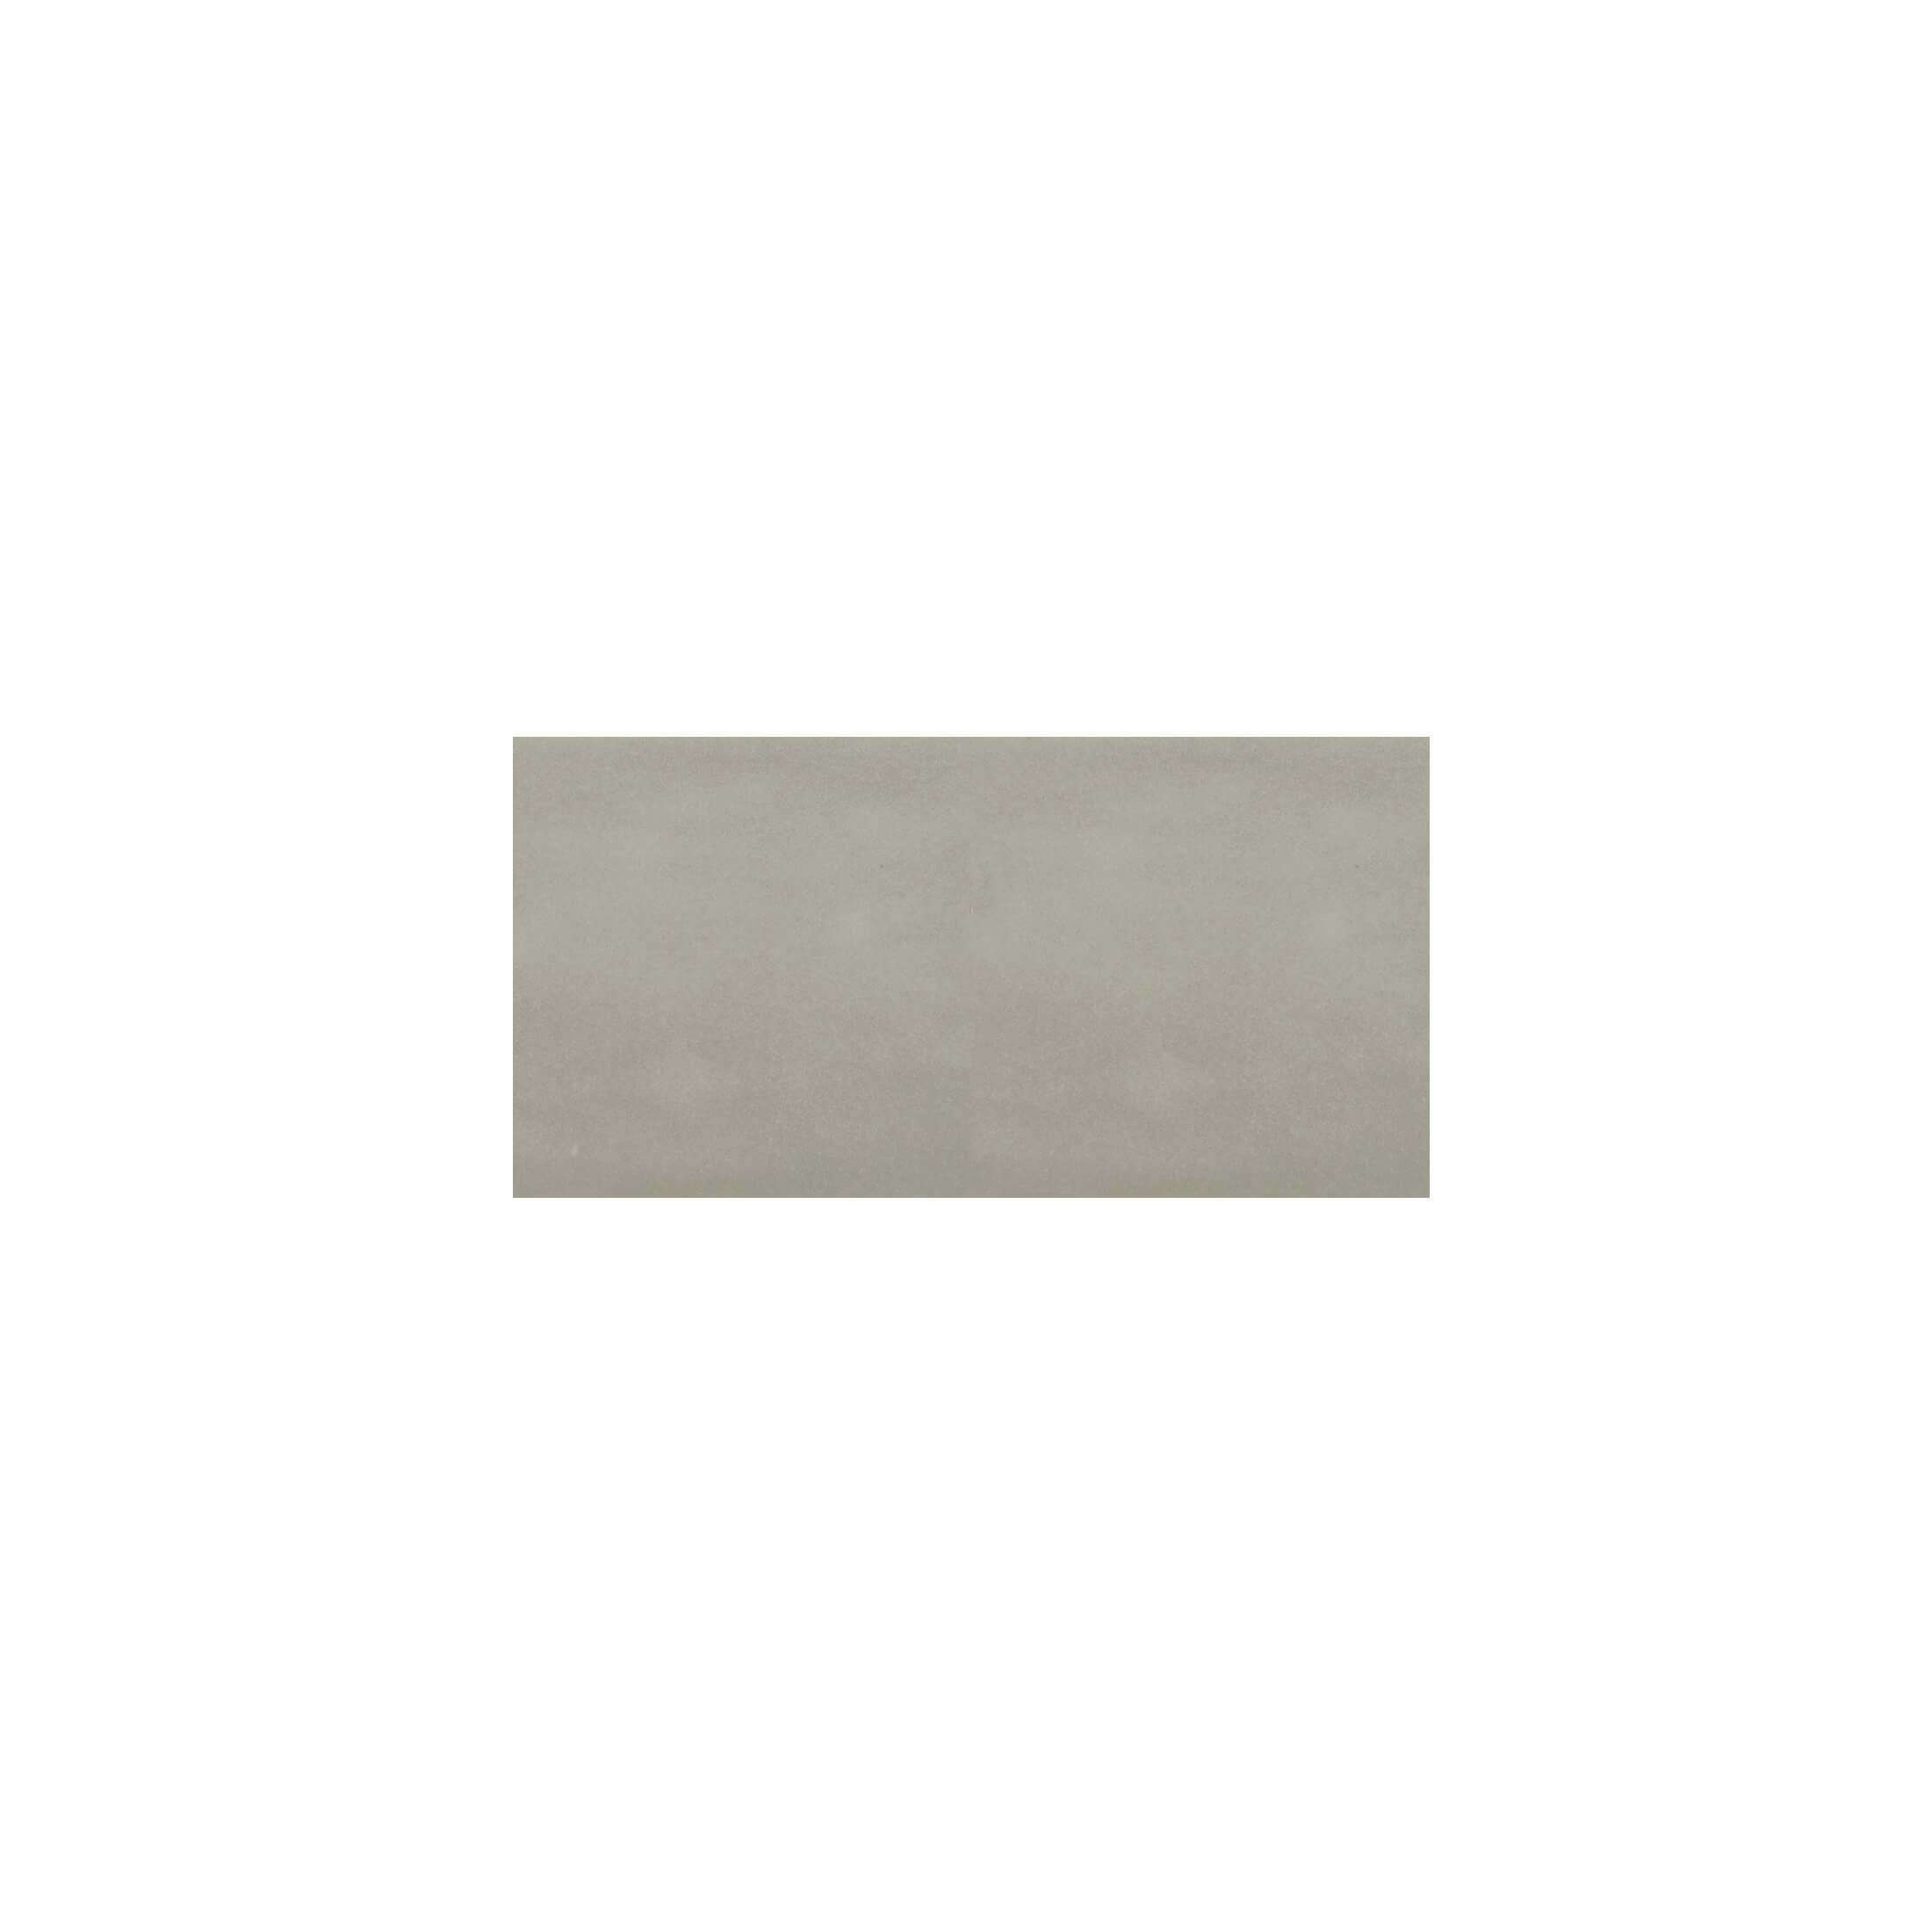 ADNT1008 - LISO  - 7.5 cm X 15 cm